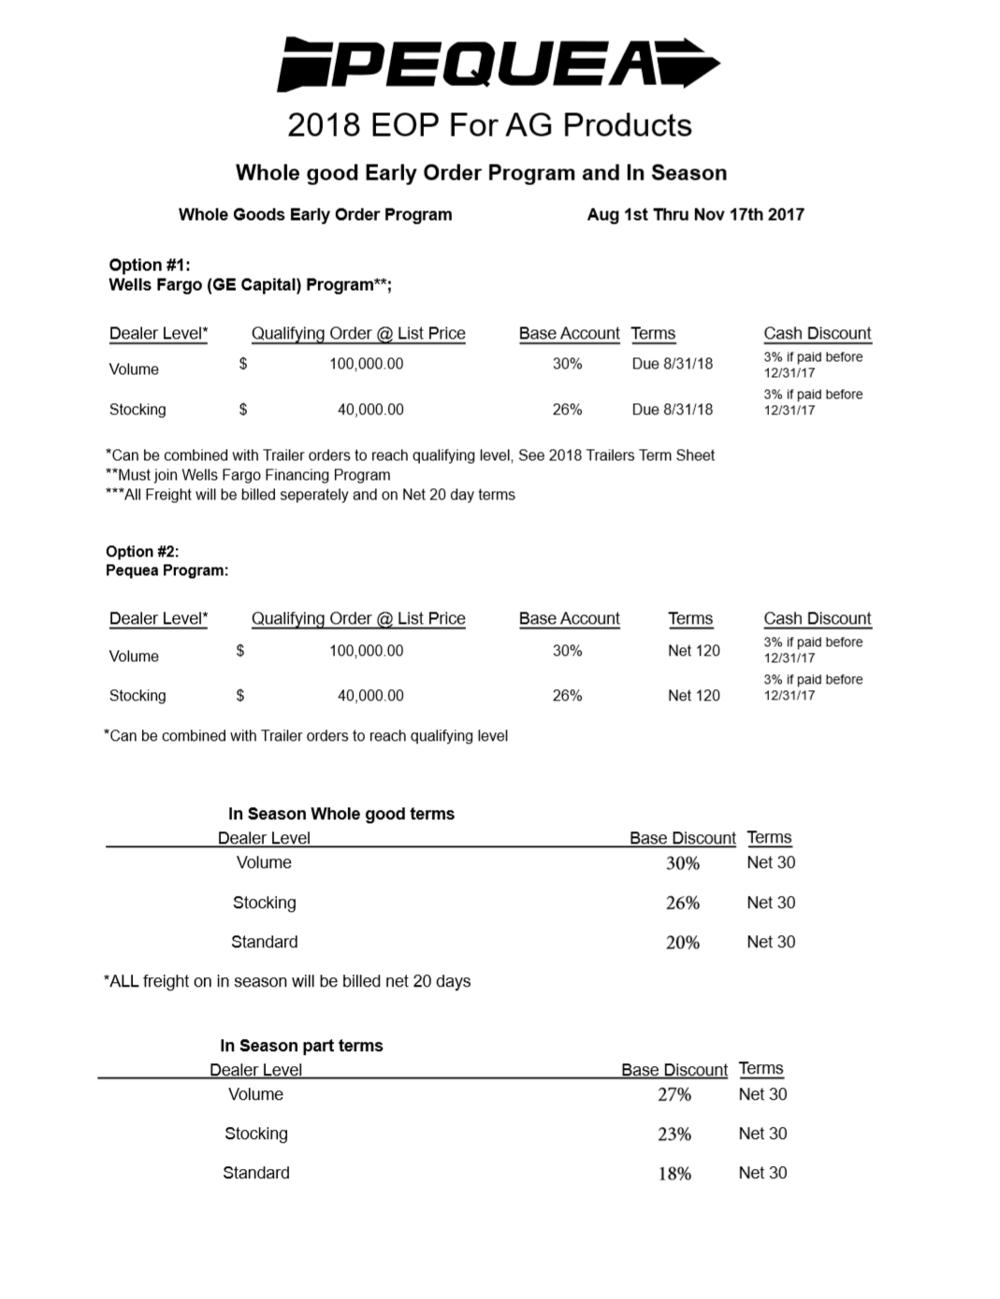 Early Order Program